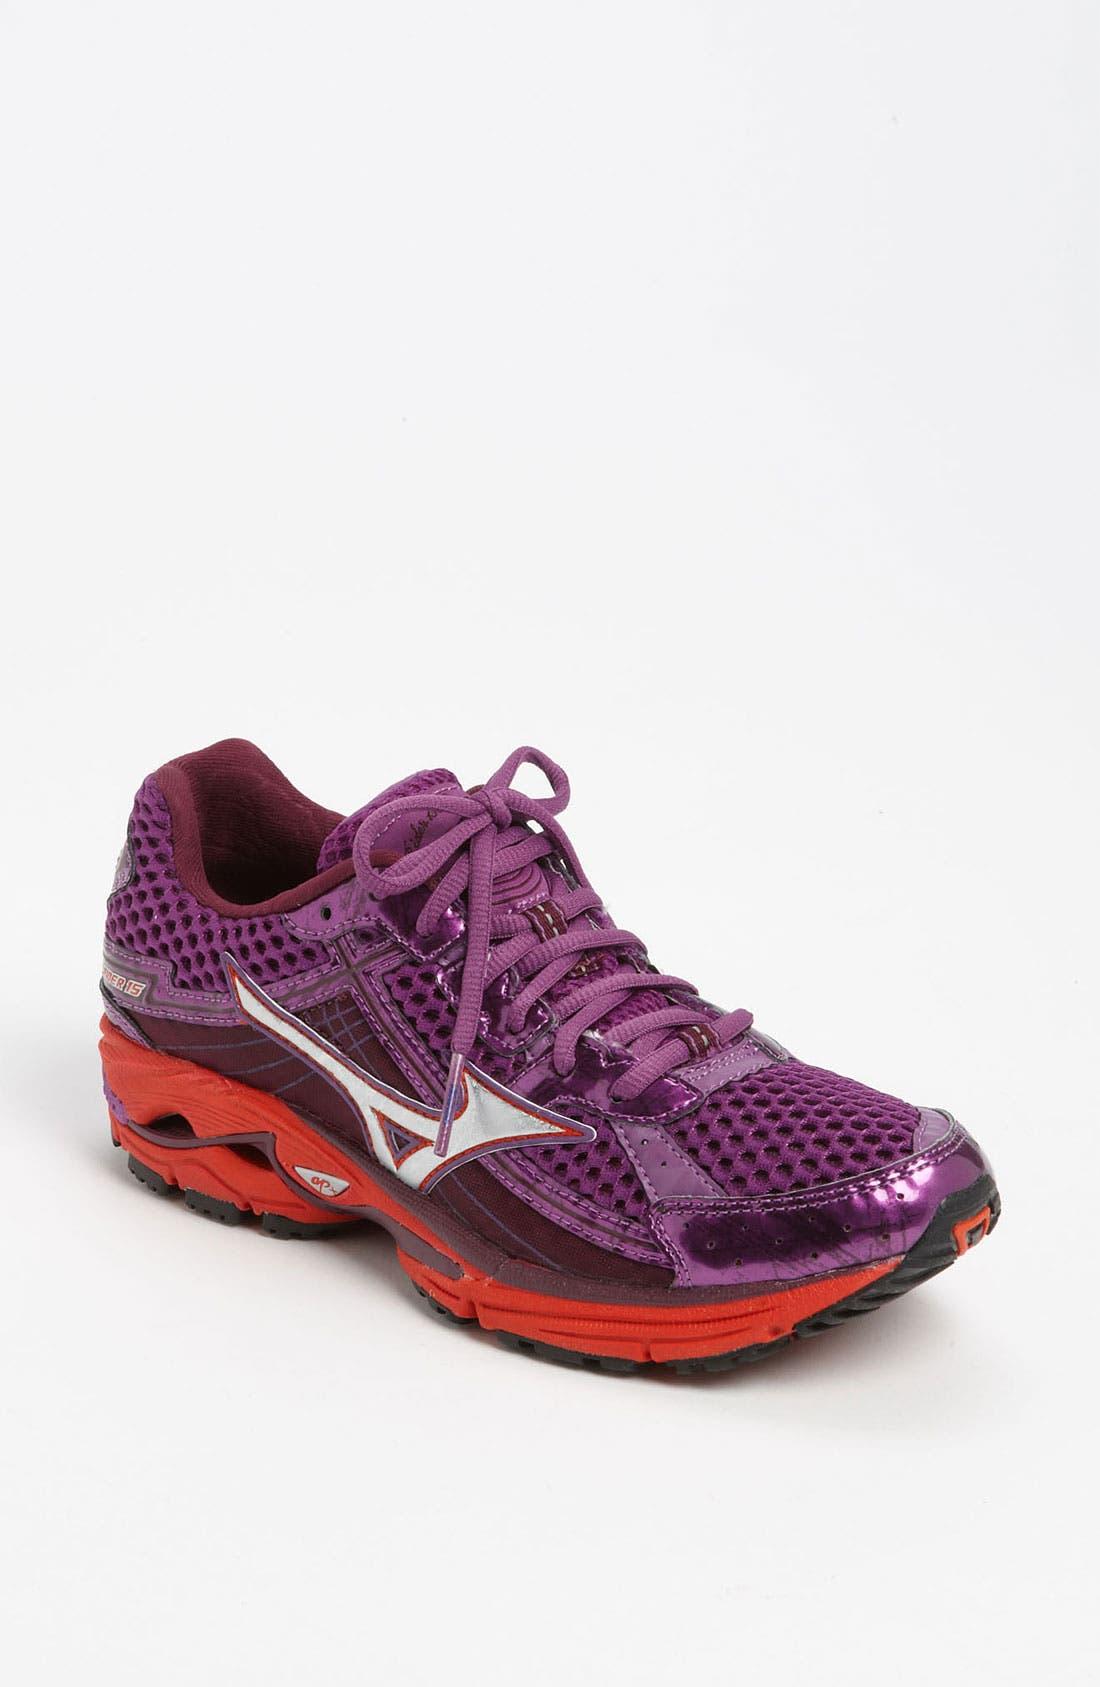 Main Image - Mizuno 'Wave Rider 15' Running Shoe (Women) (Regular Retail Price: $144.95)